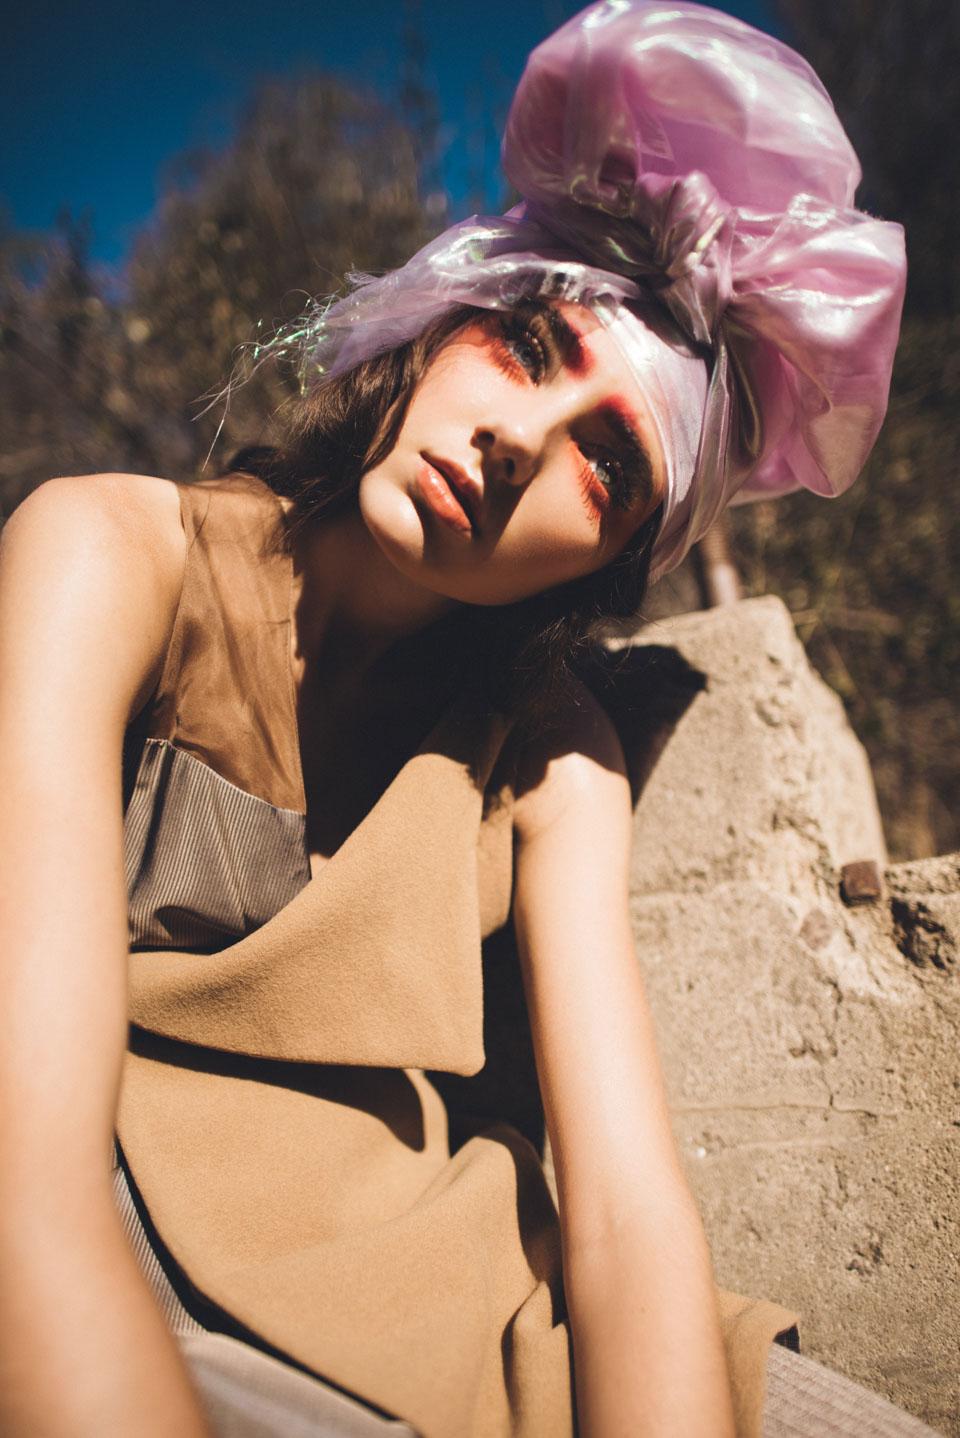 erika astrid fashion photographer and artist51.jpg